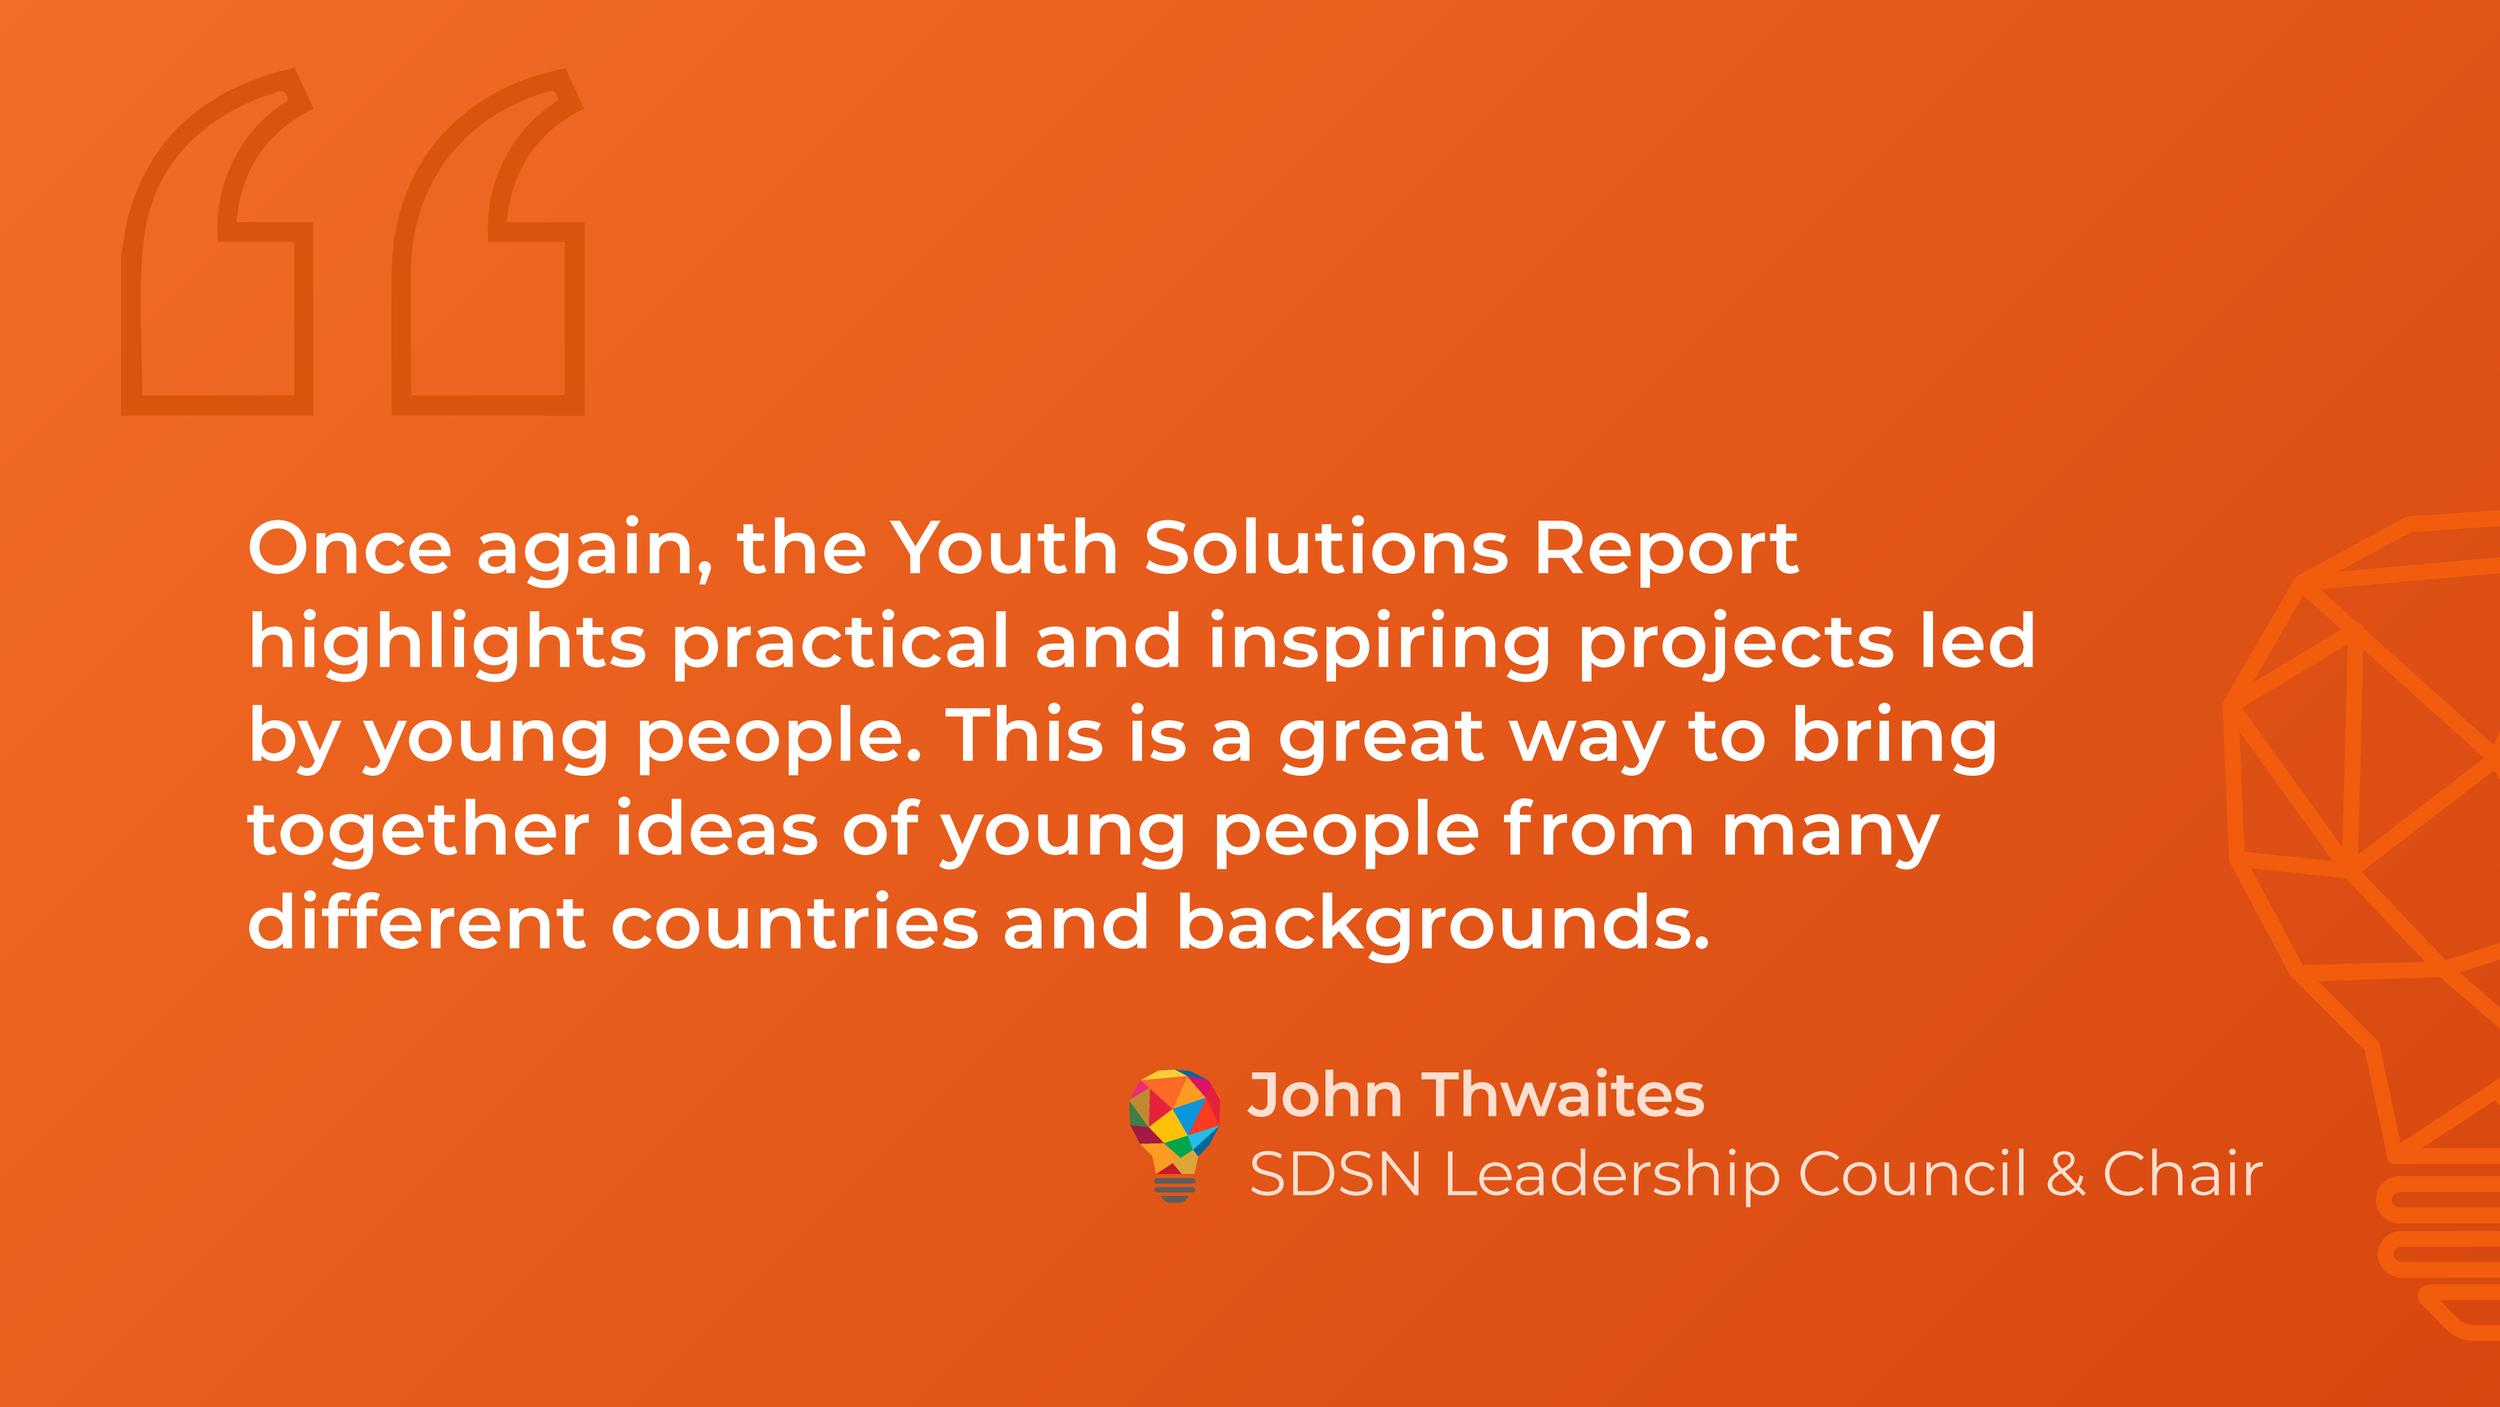 YSR-quote-JohnThwaites.png